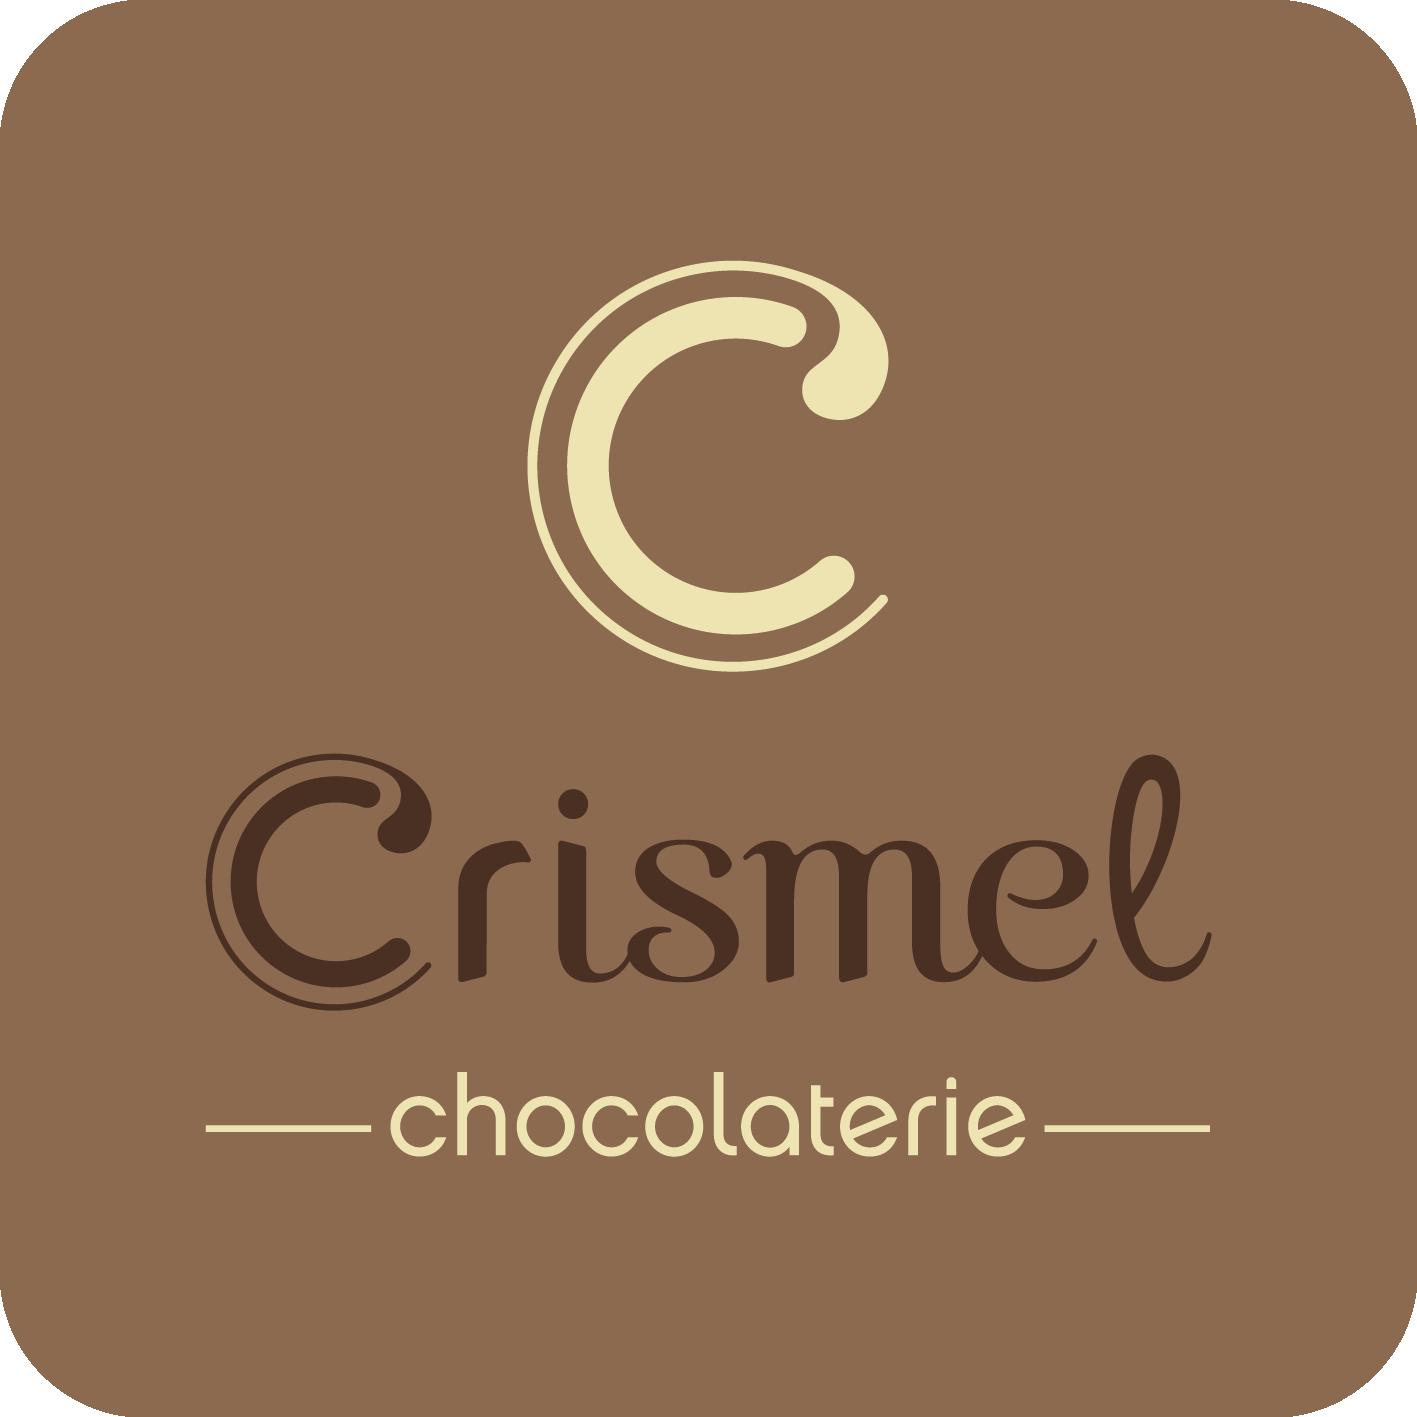 Crismel Chocolaterie